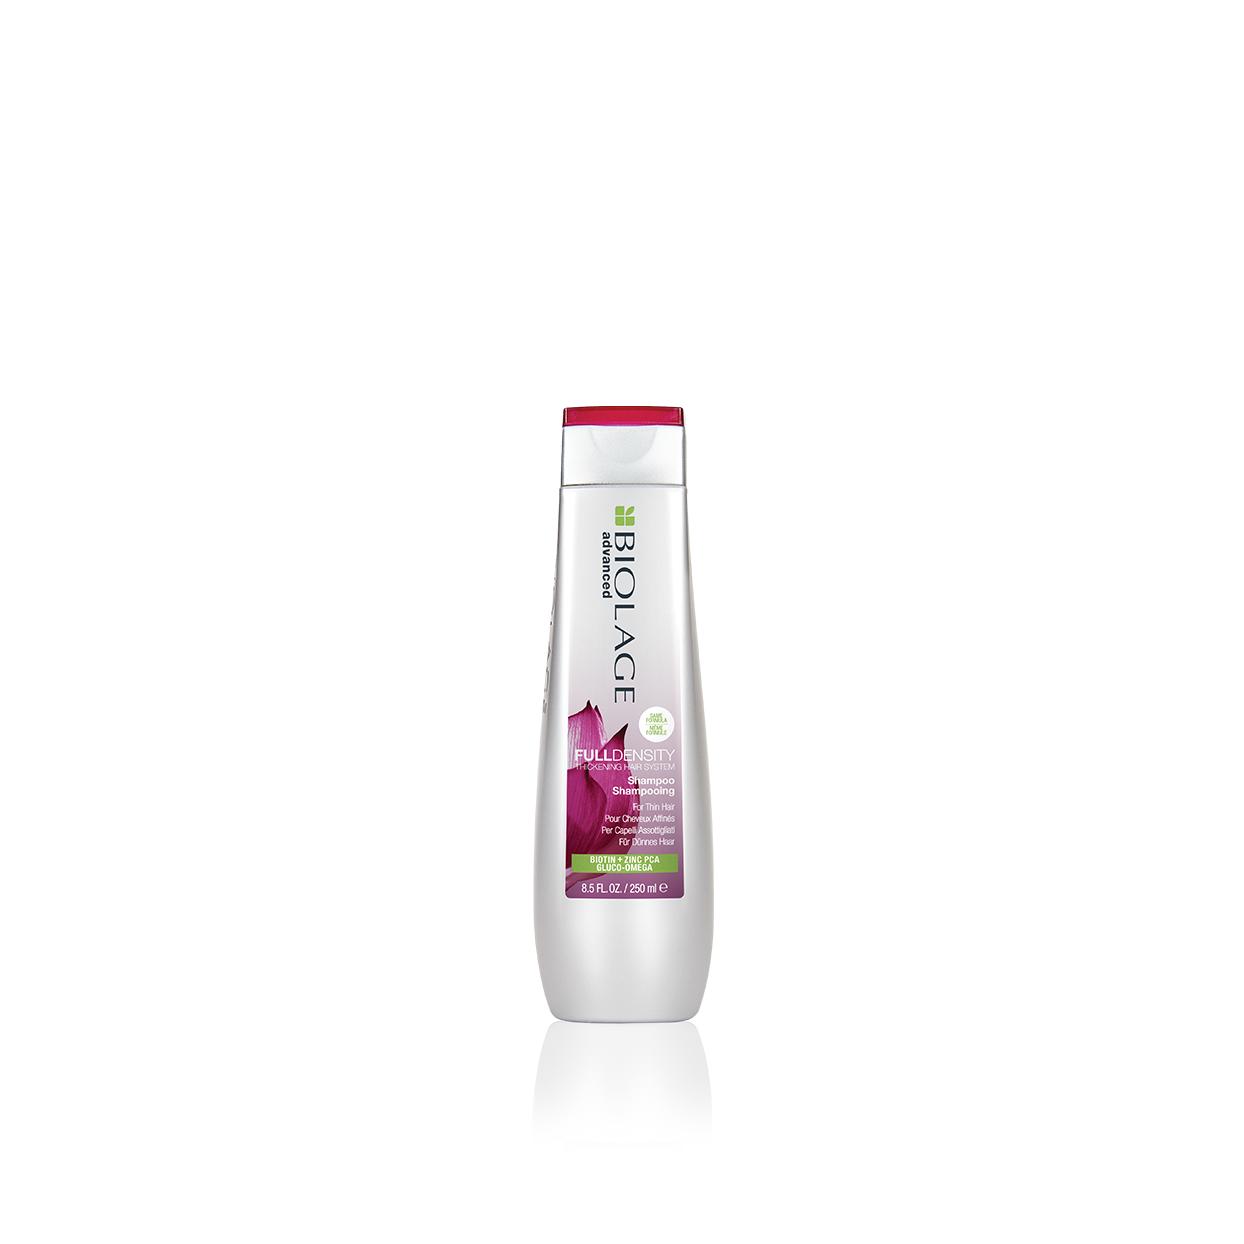 Biolage Advanced FullDensity Thin Hair Shampoo Thickening Shampoo for Thin Hair